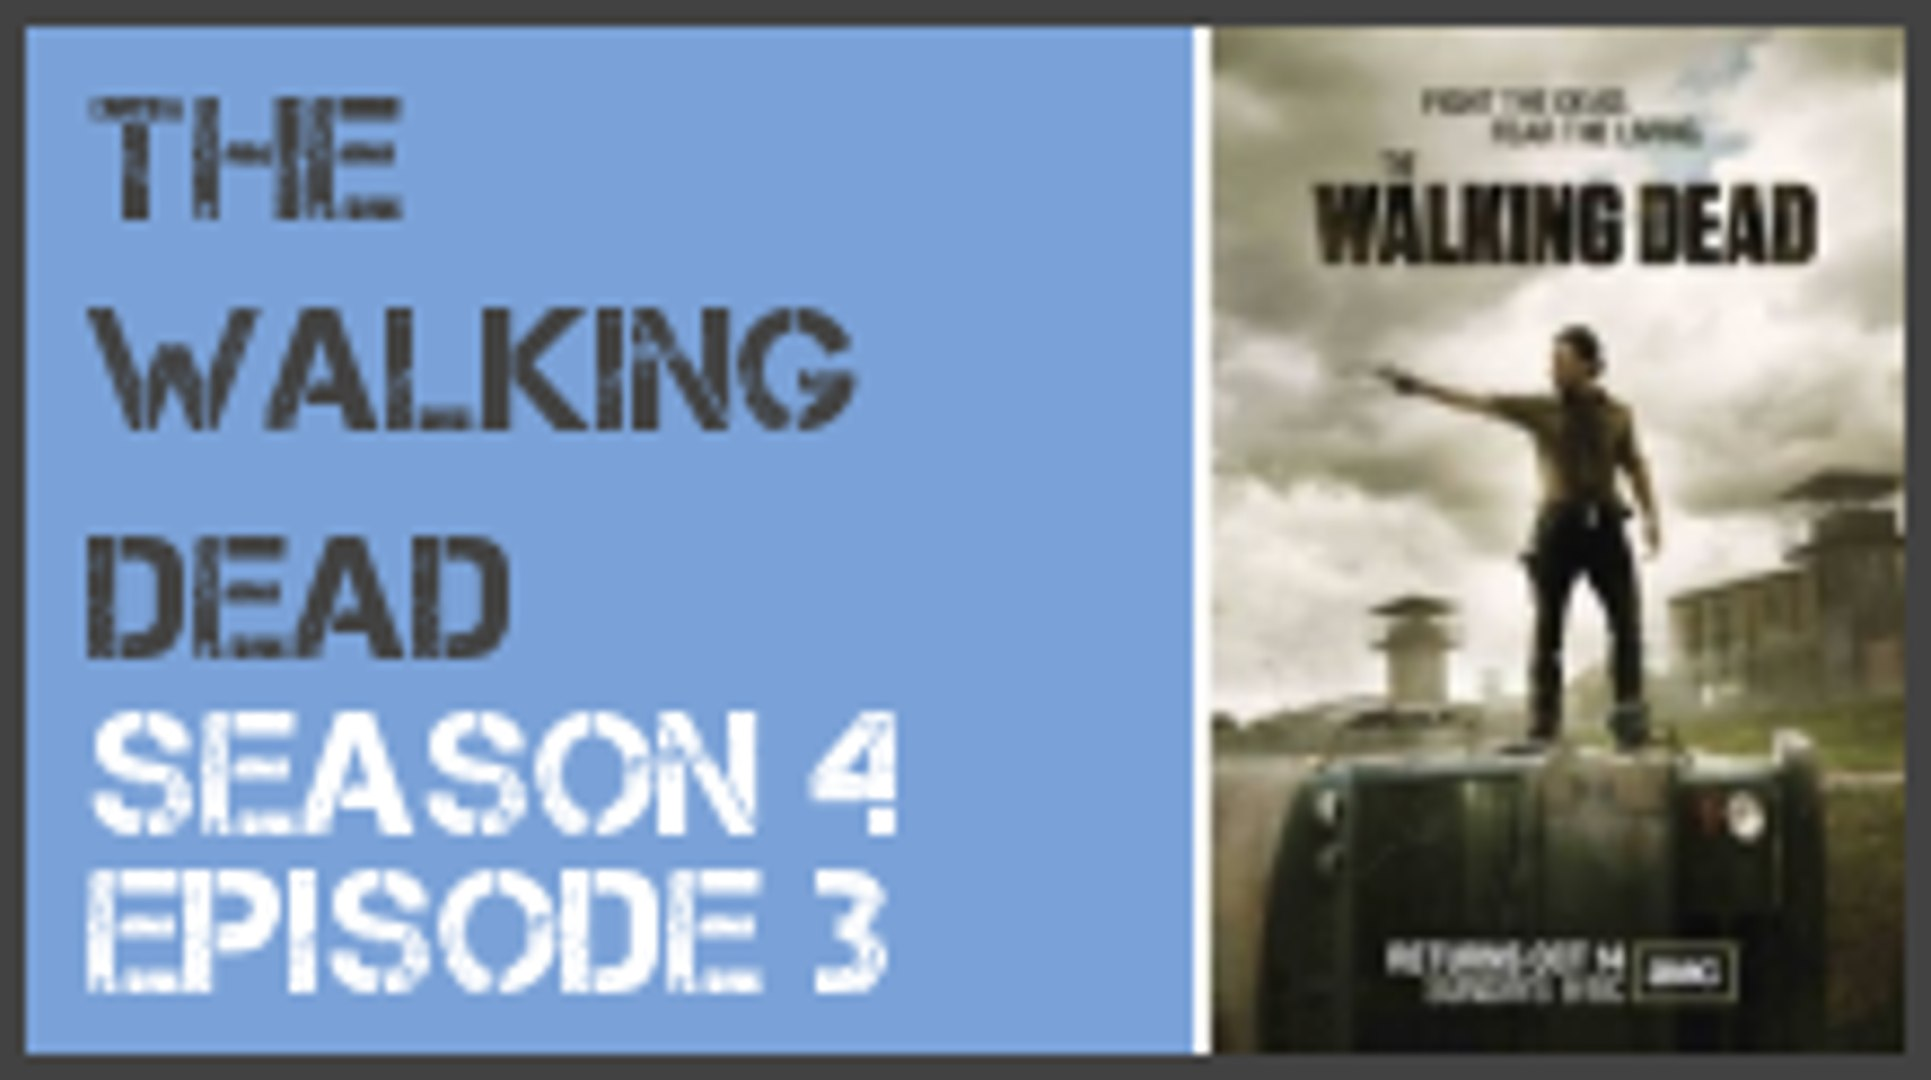 The Walking Dead season 4 episode 3 s4e3